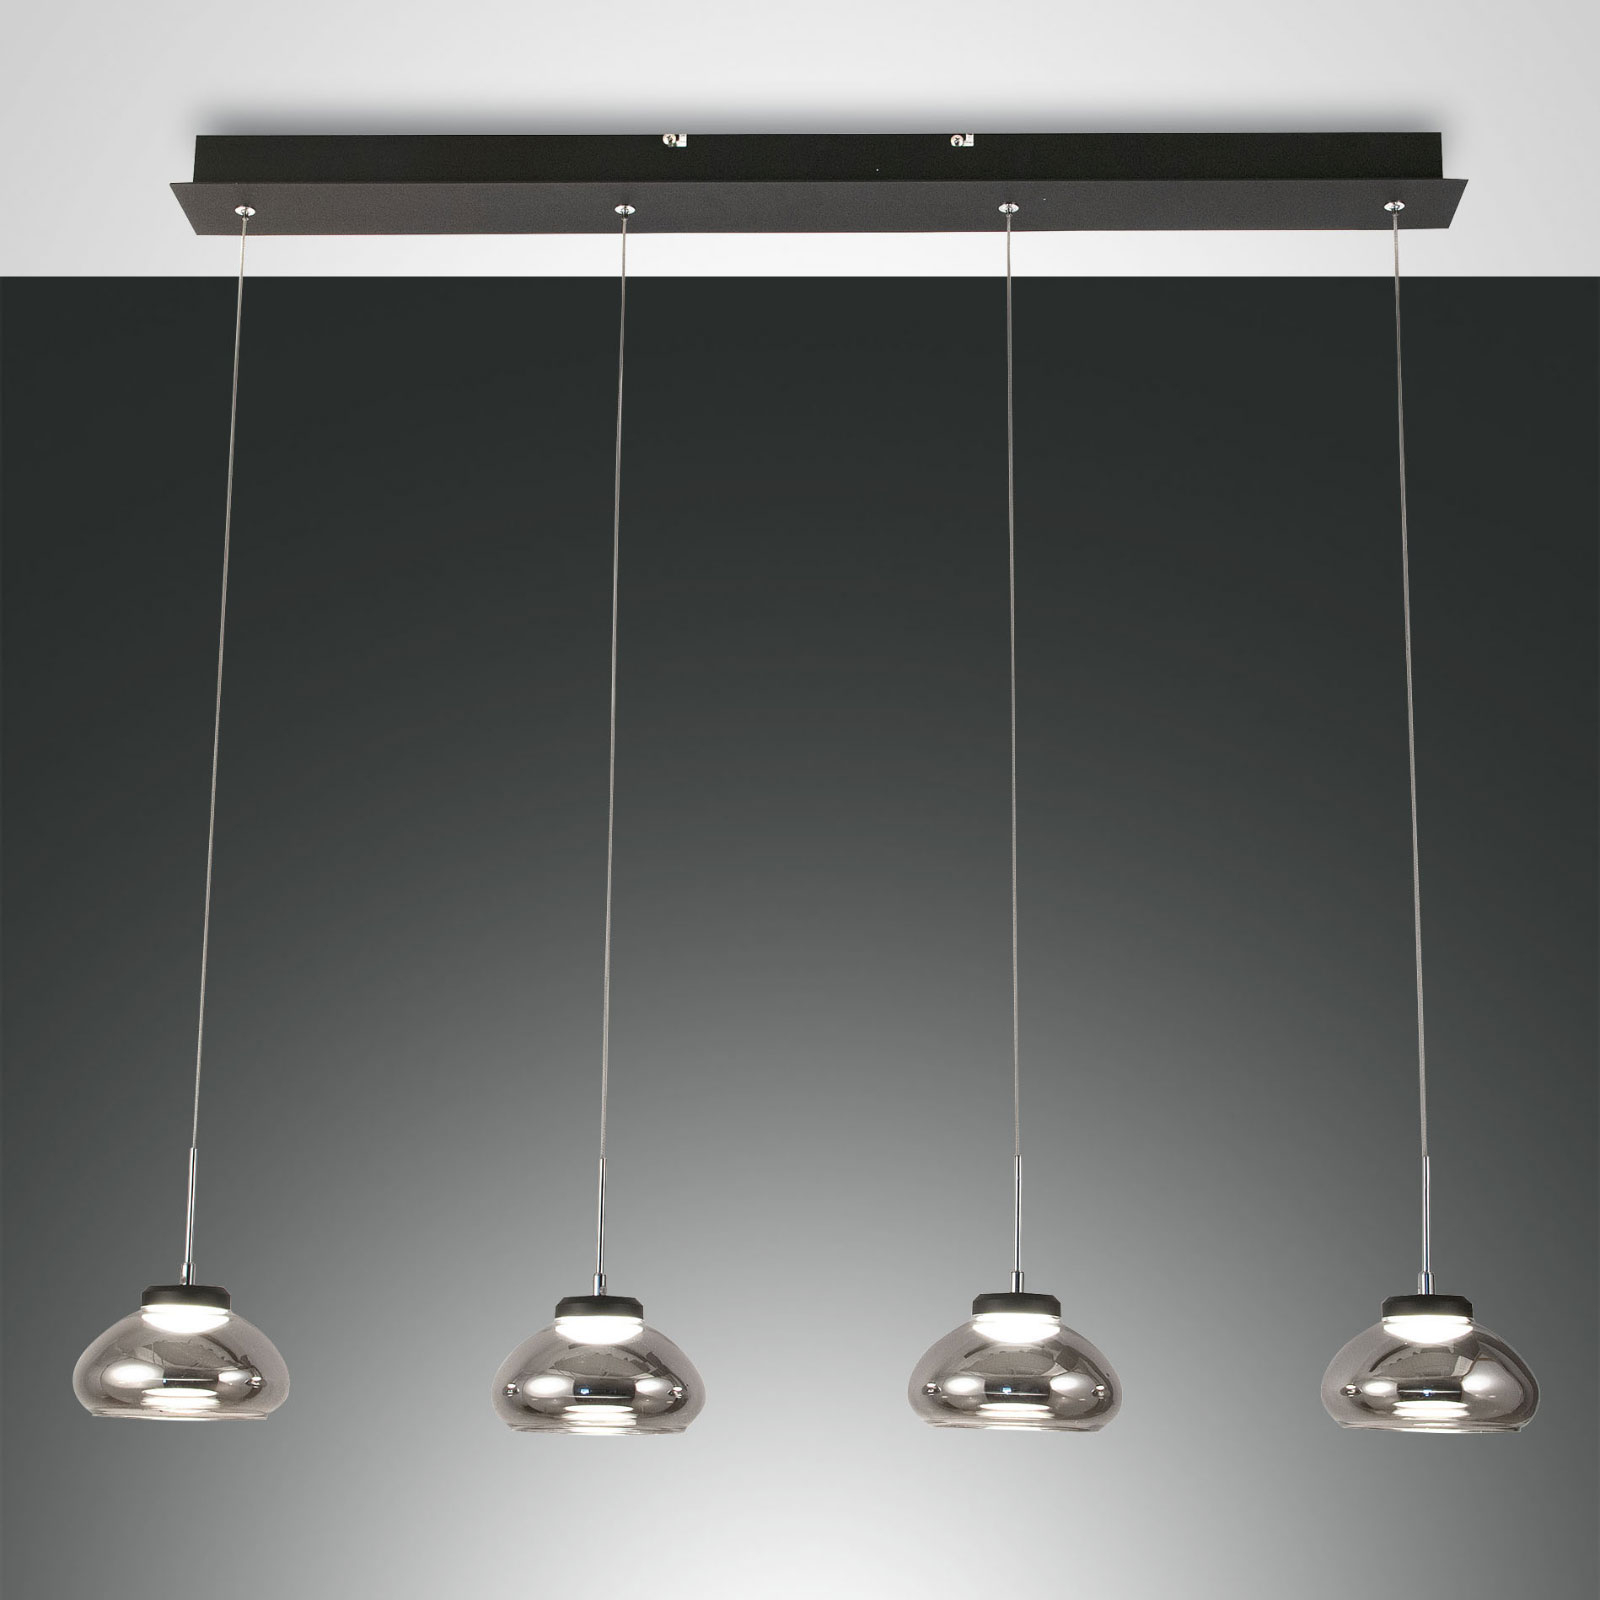 Hanglamp Arabella 4-lamps in rij, rookgrijs